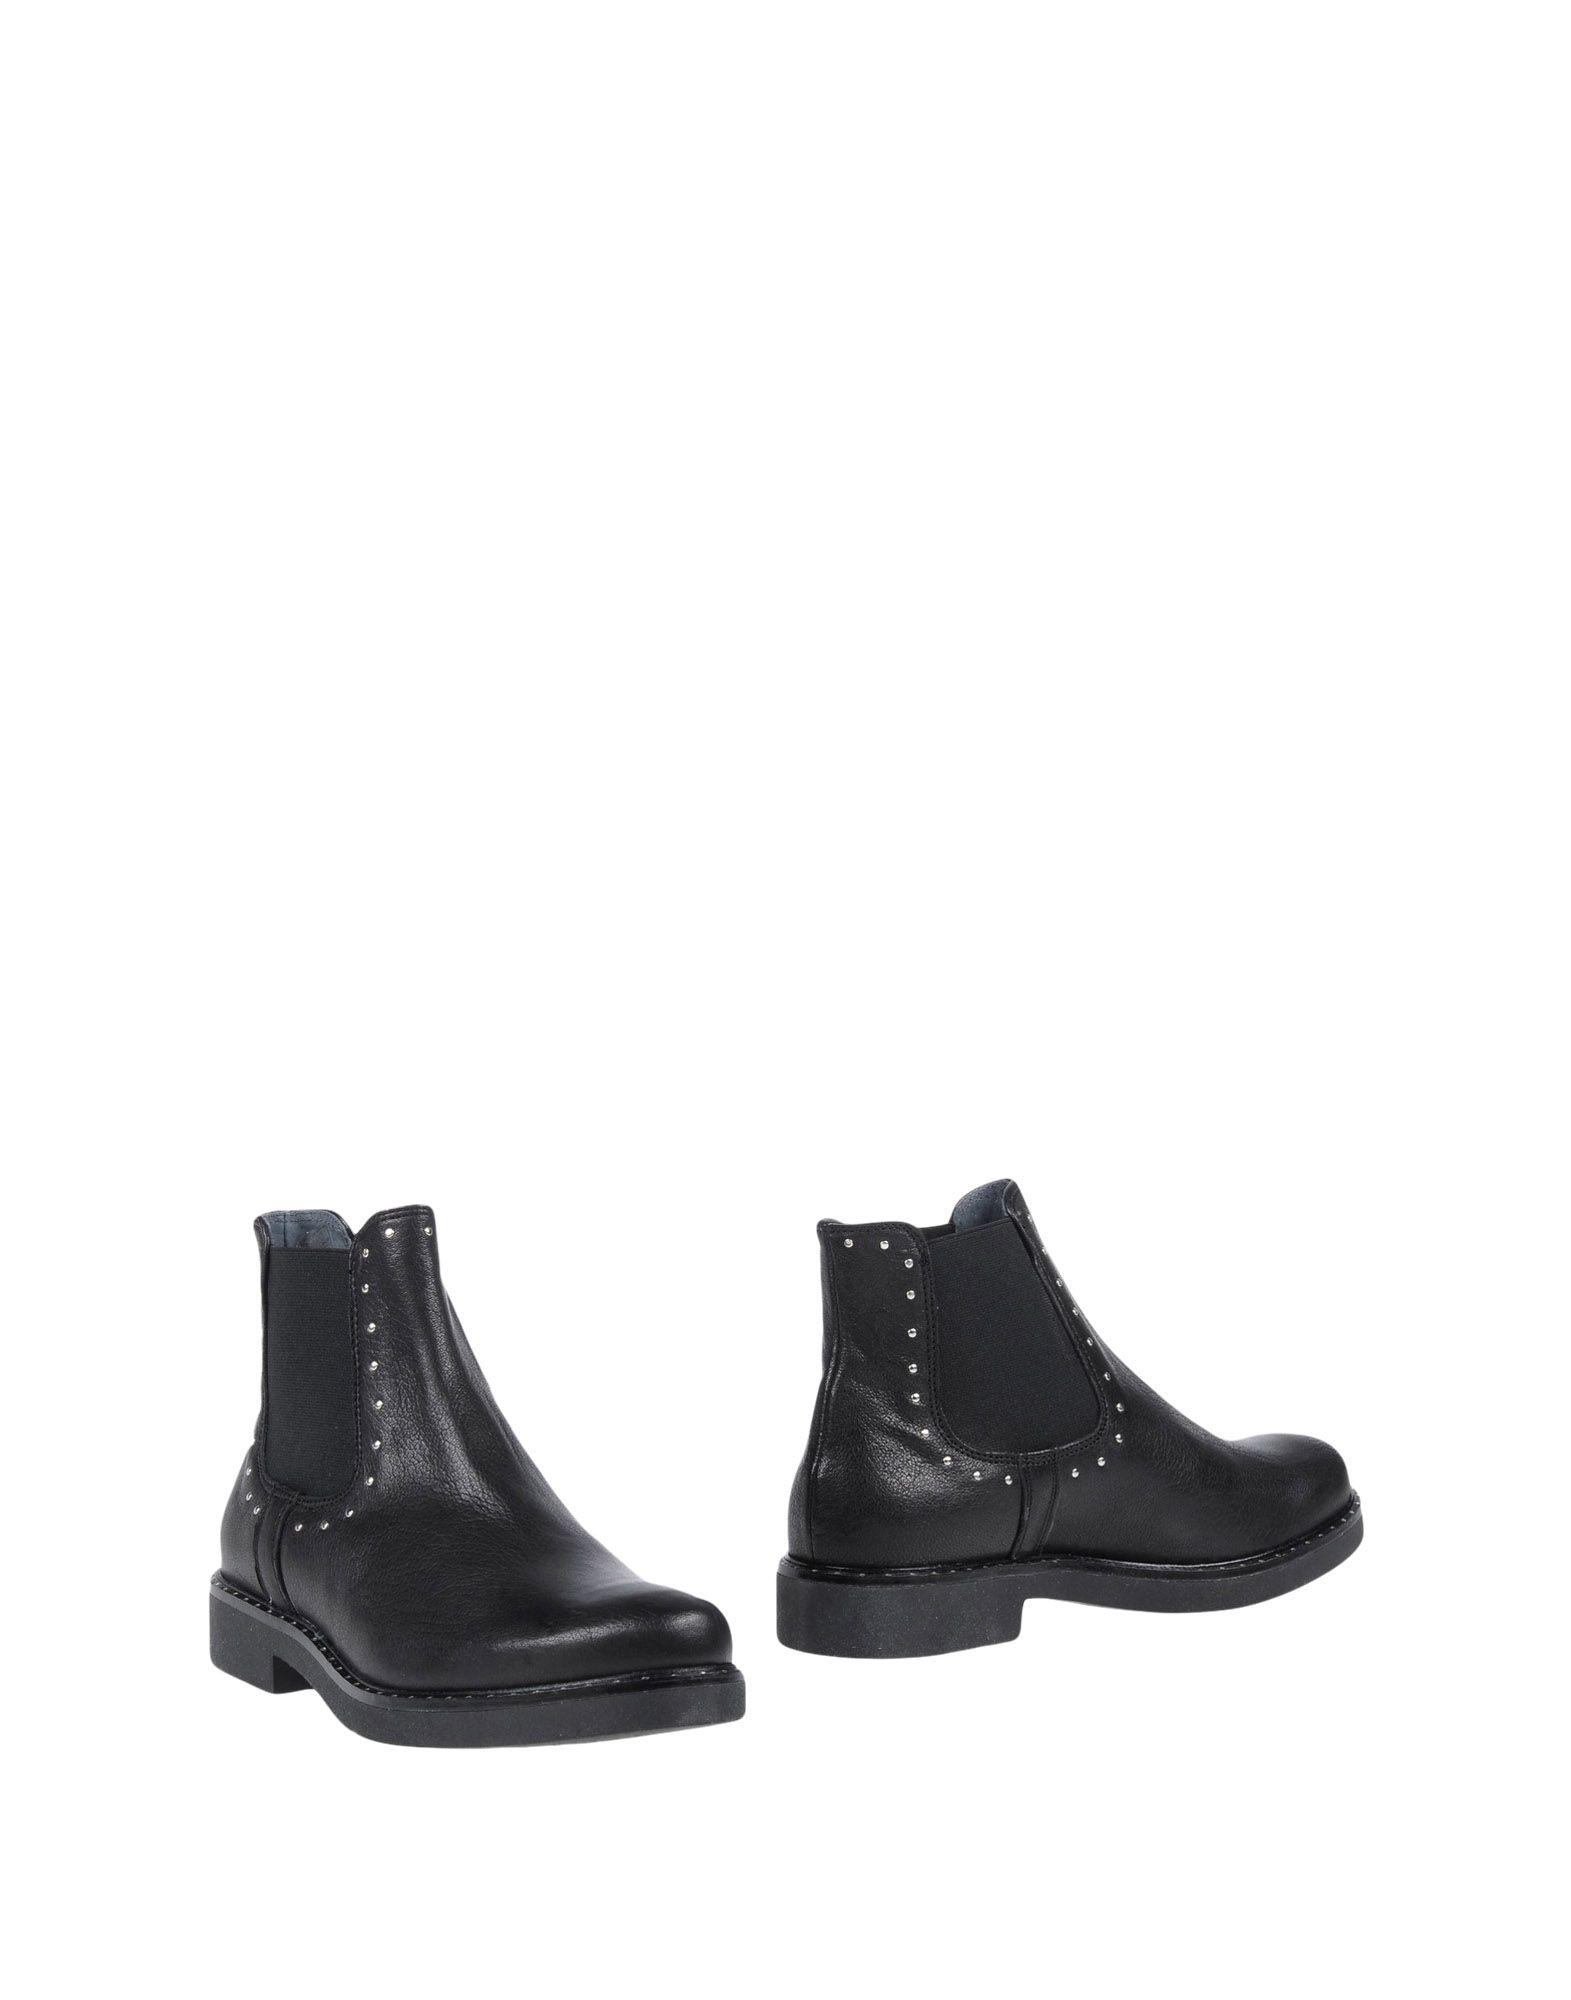 Oroscuro Chelsea Boots Damen  11456077OI Gute Qualität beliebte Schuhe